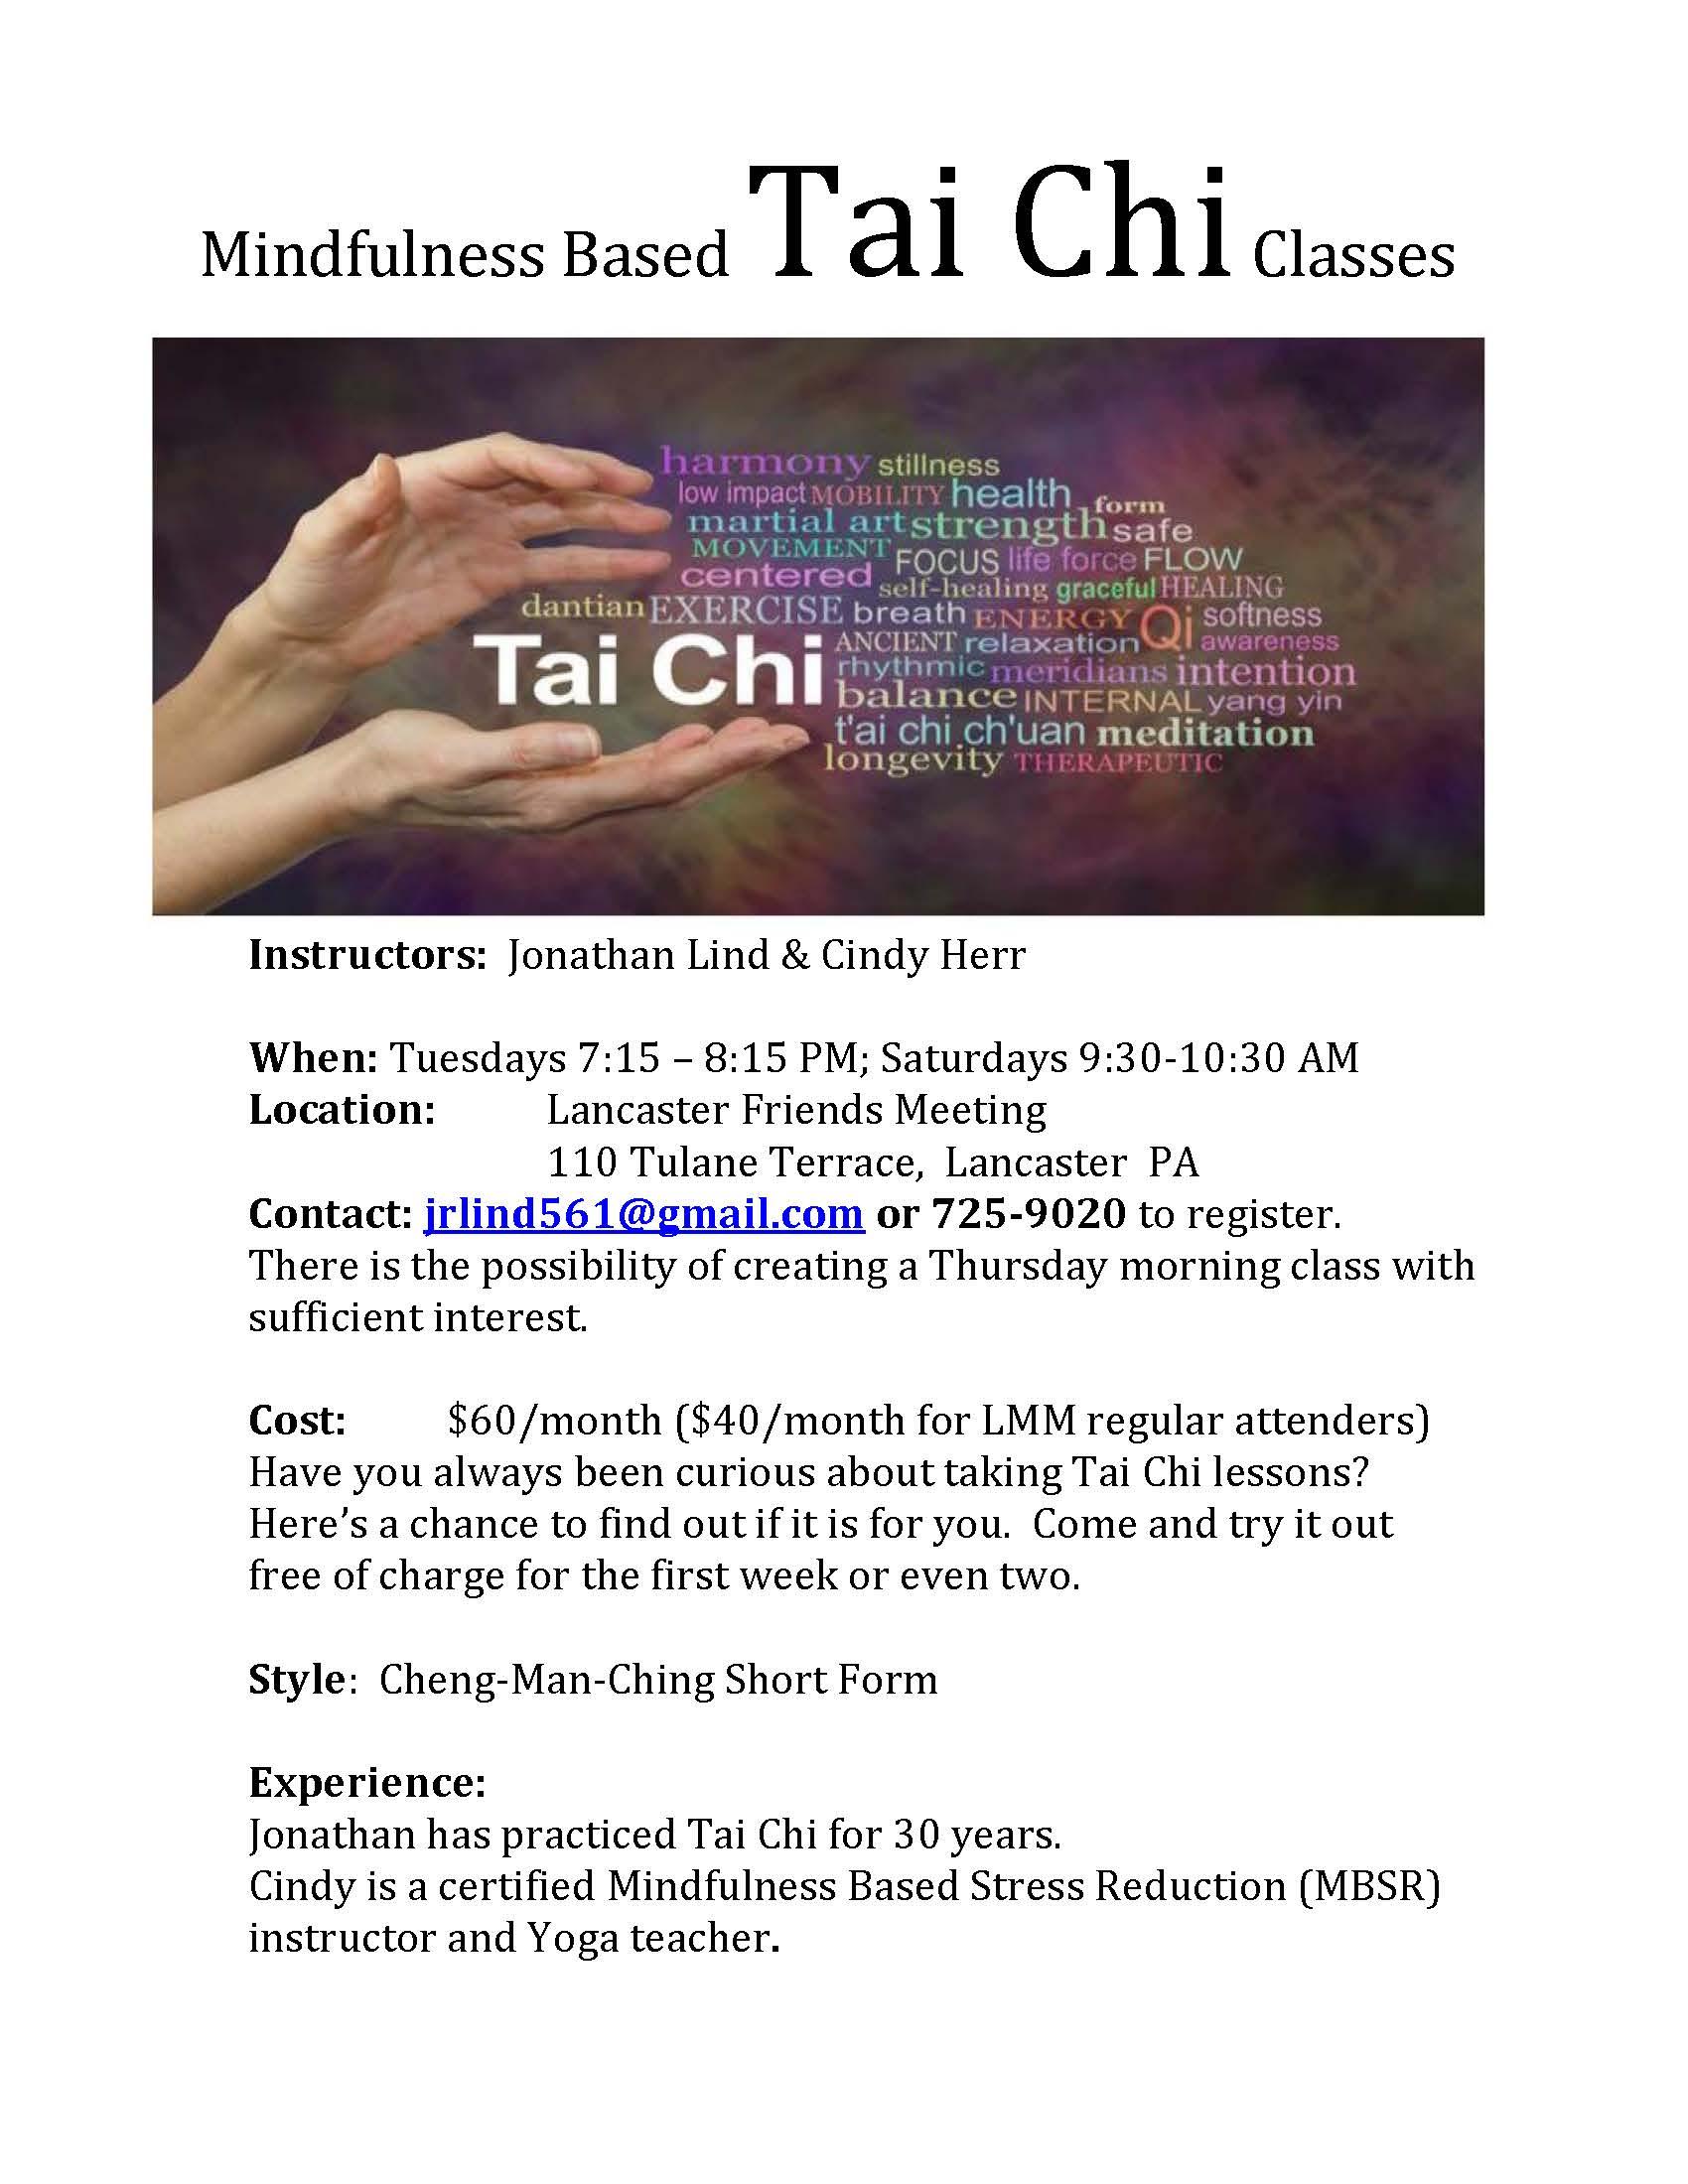 JL_Tai Chi Flyer pg. 1.jpg